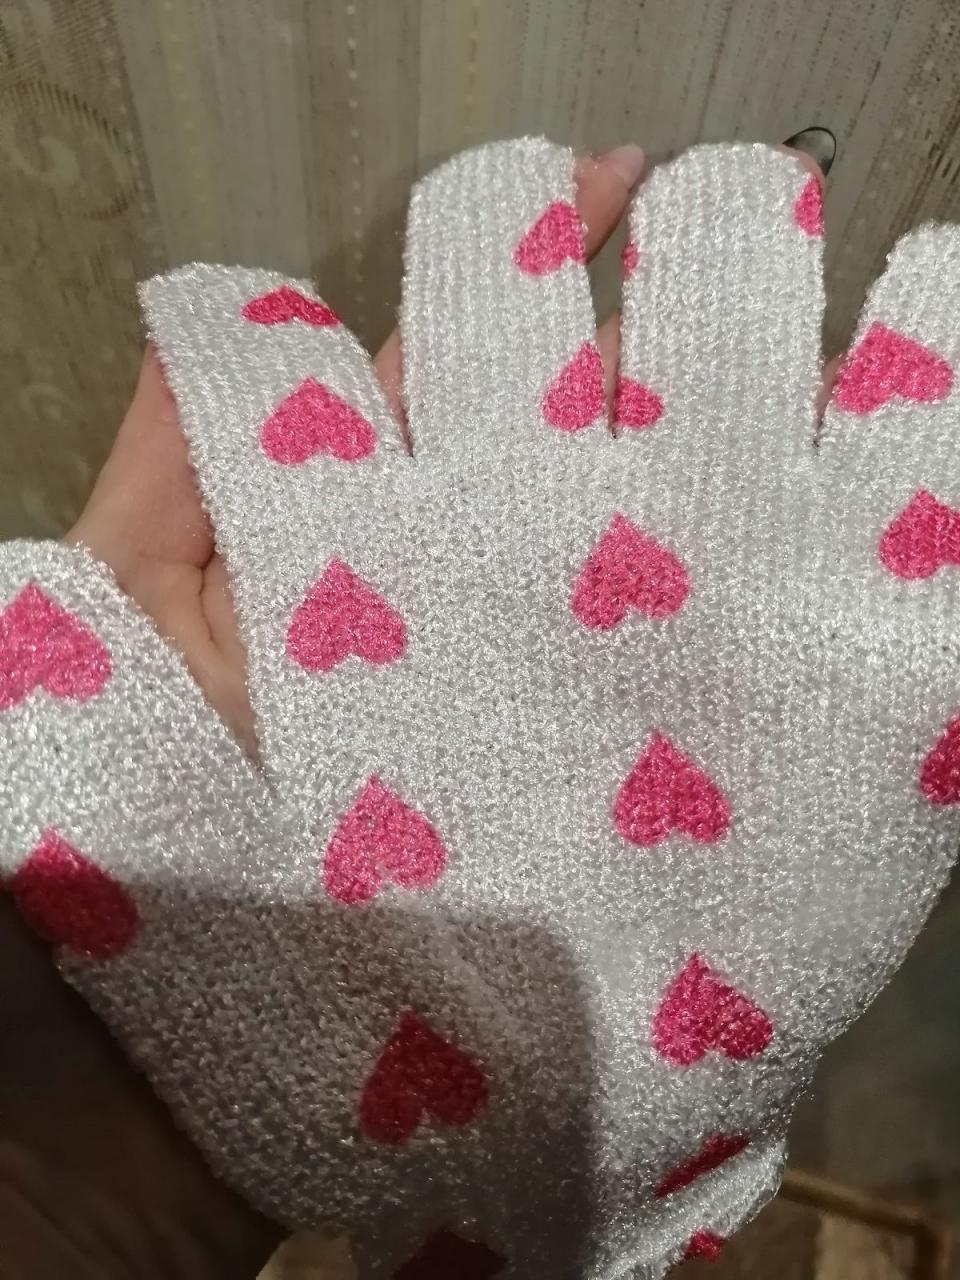 Отзыв на товар: Мочалка-перчатка массажная. Доляна. Вид 1 от 1614883965